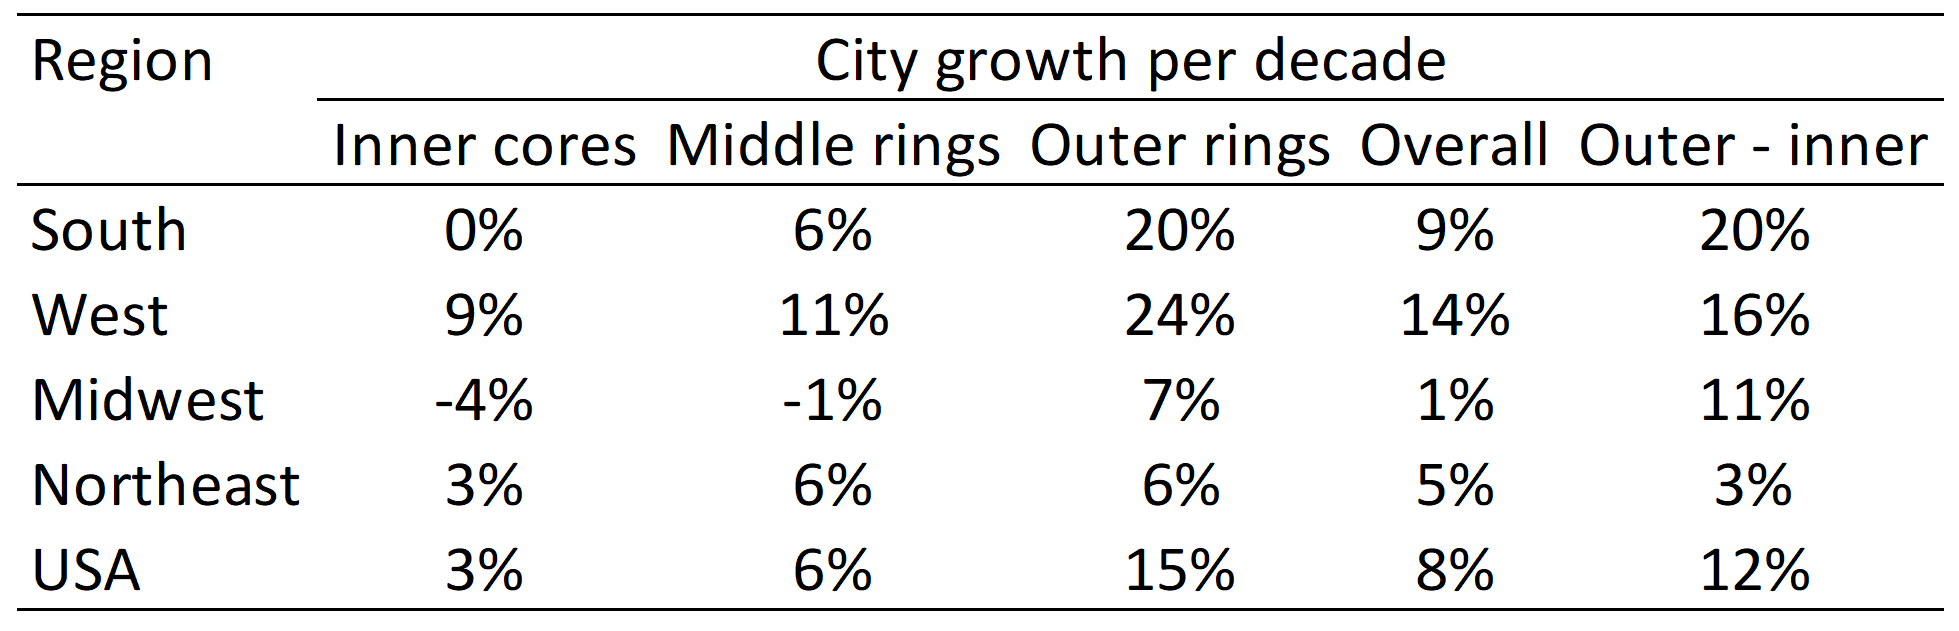 Urbanization Growth Rates (100 Largest Cities, 1990-2000)